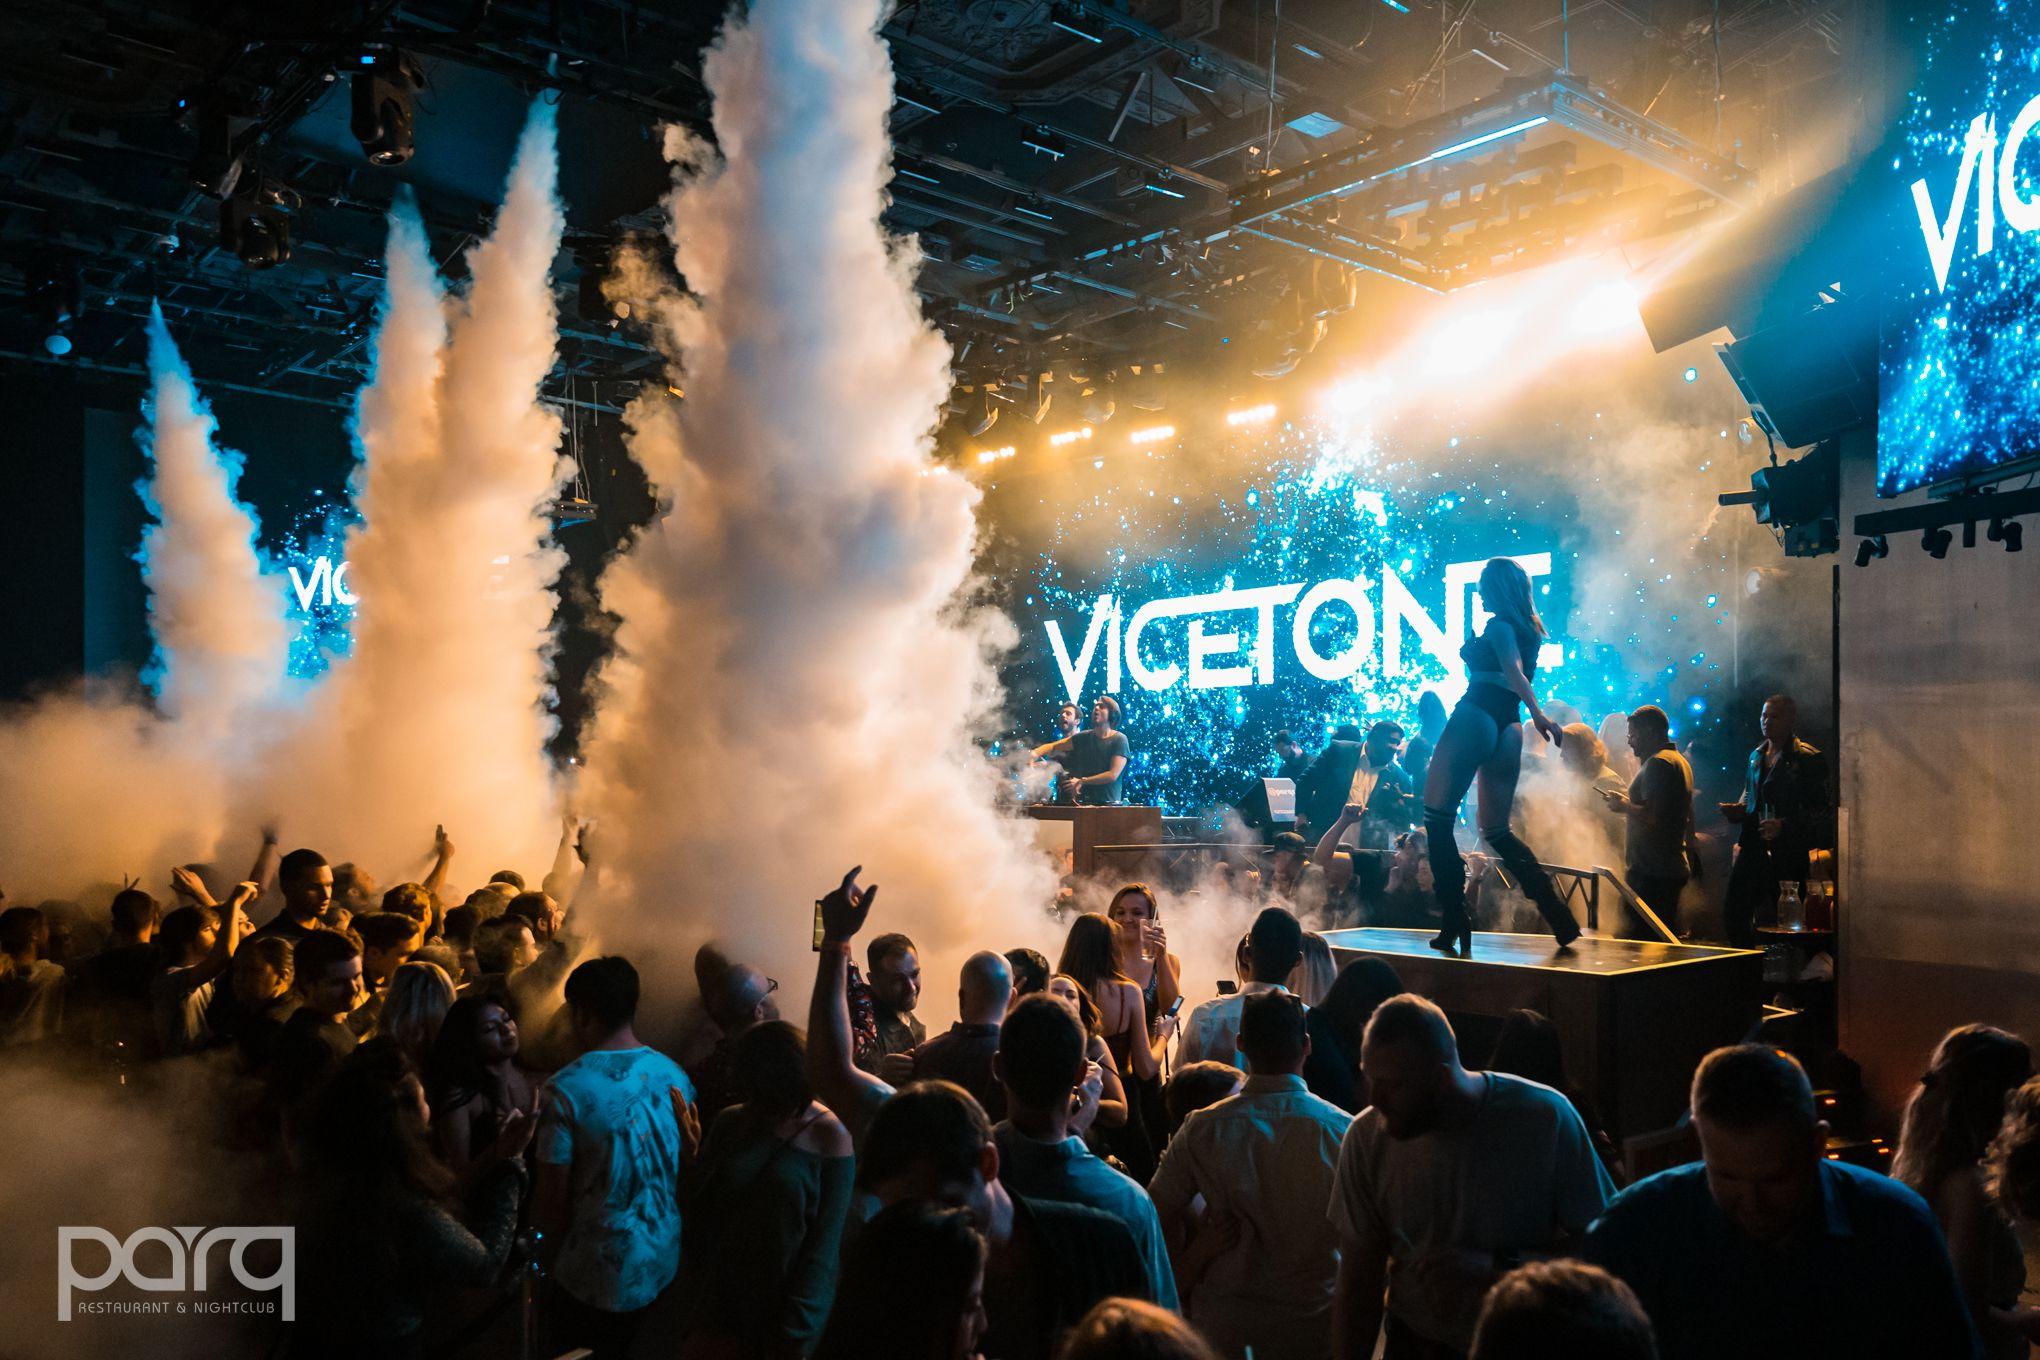 11.09.19 Parq - Vicetone-1.jpg